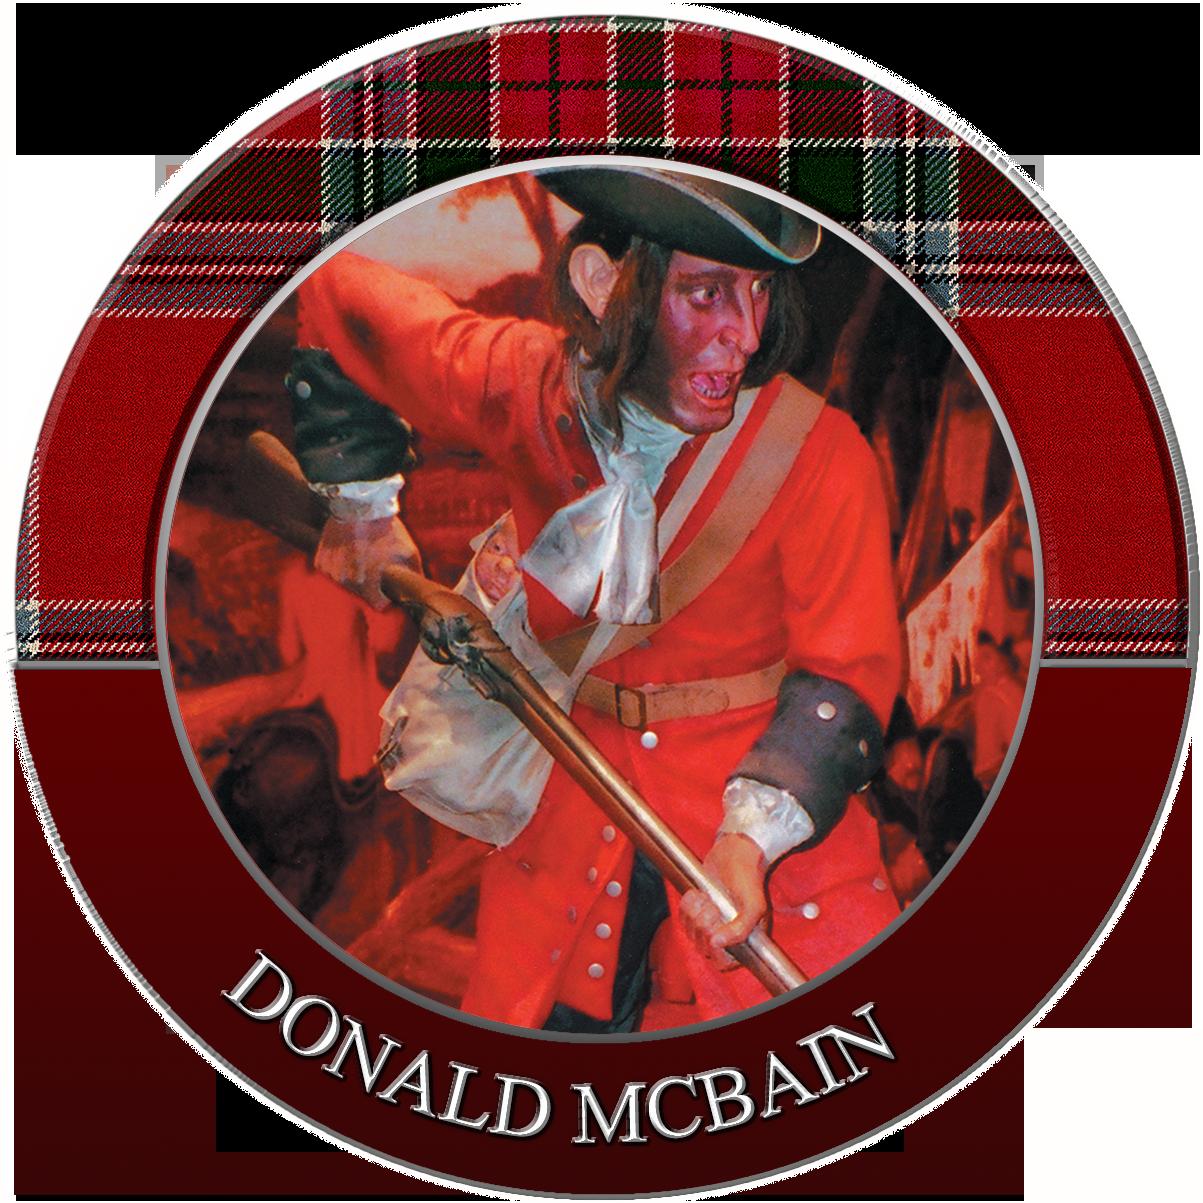 Donald McBaine